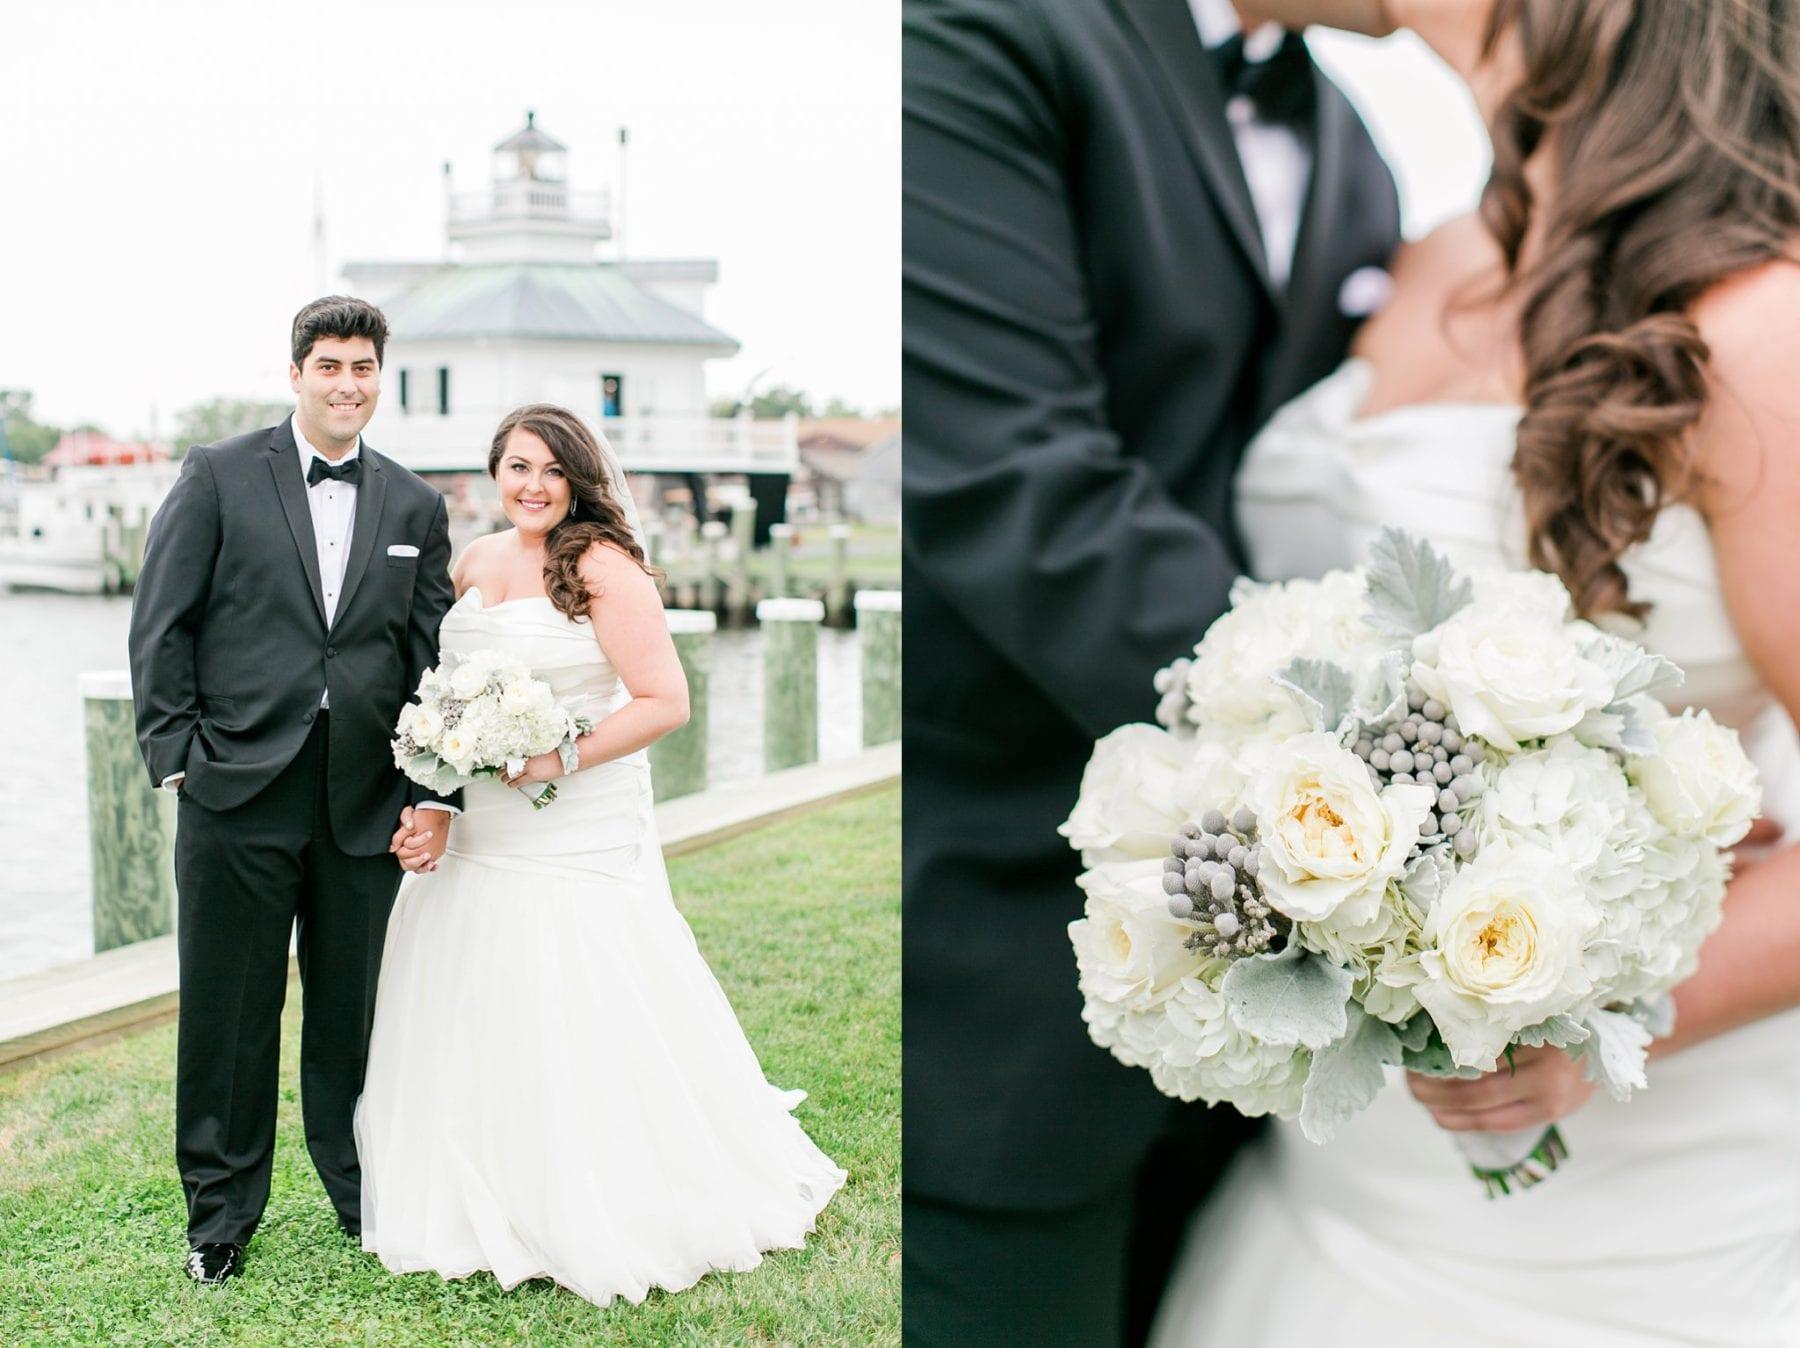 Chesapeake Bay Maritime Museum Wedding Photos Maryland Wedding Photographer Megan Kelsey Photography Halie & Mike-68.jpg